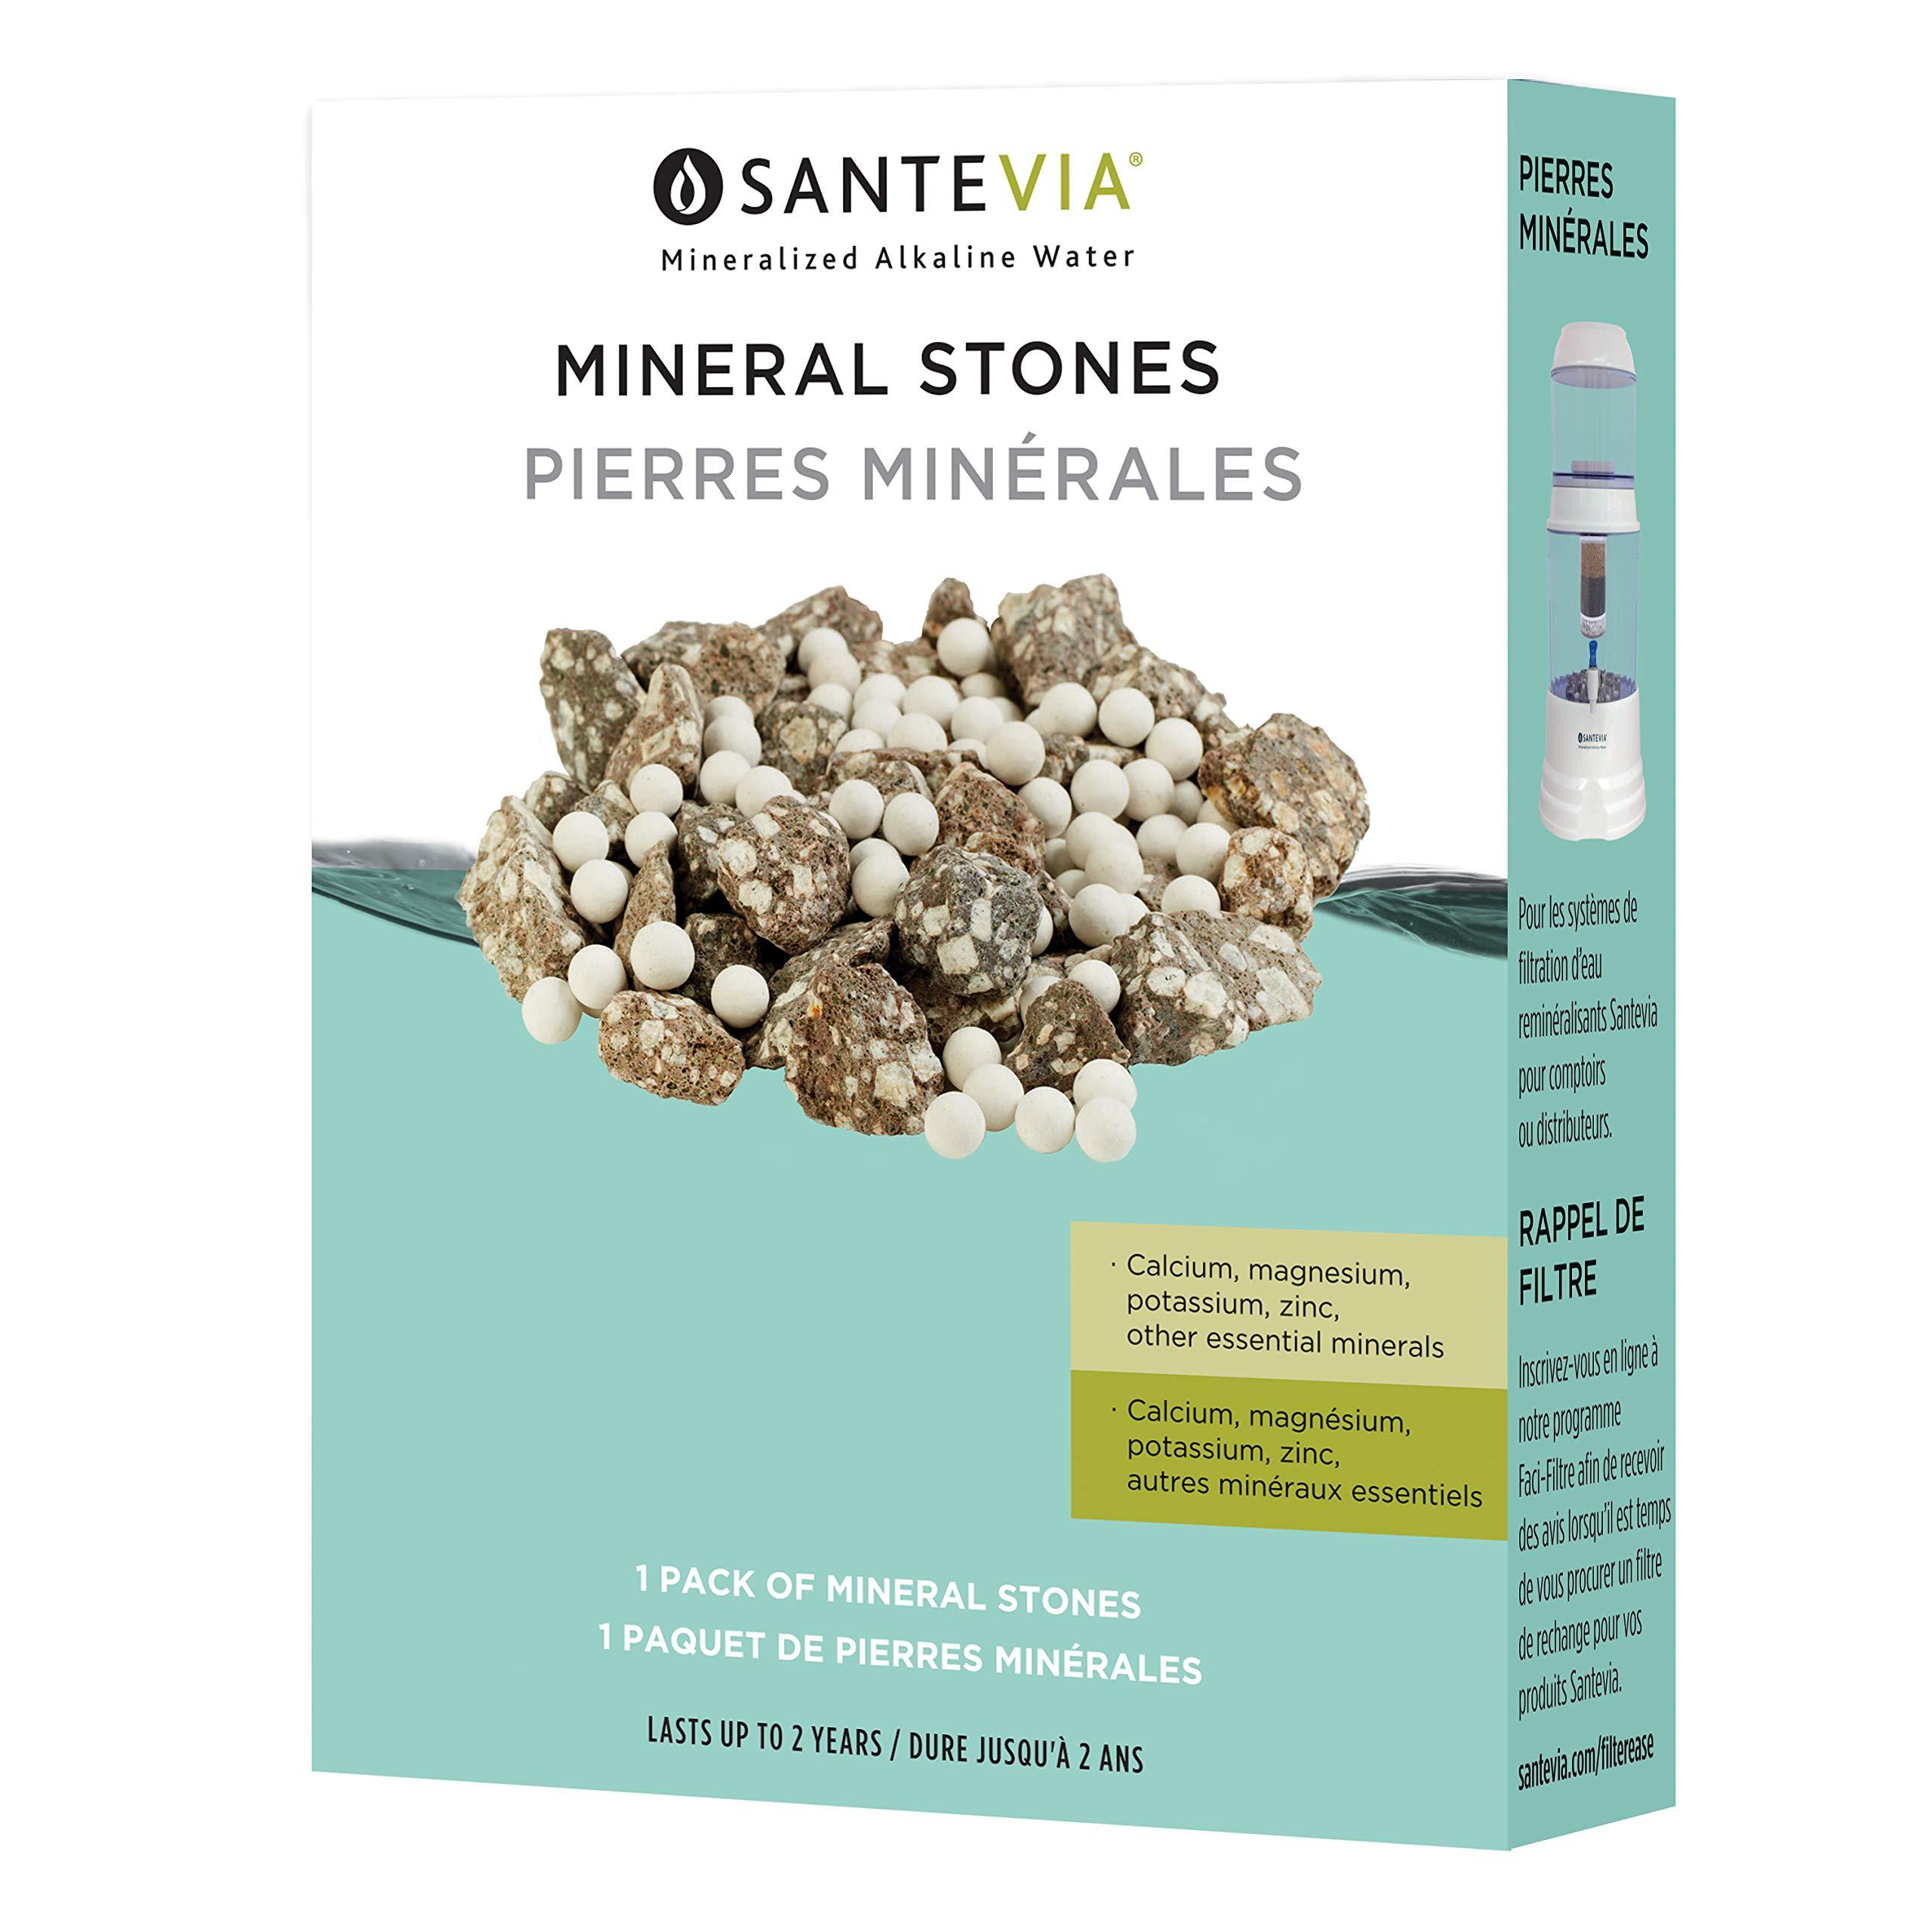 Santevia Water Systems Mineral Stones by Santevia